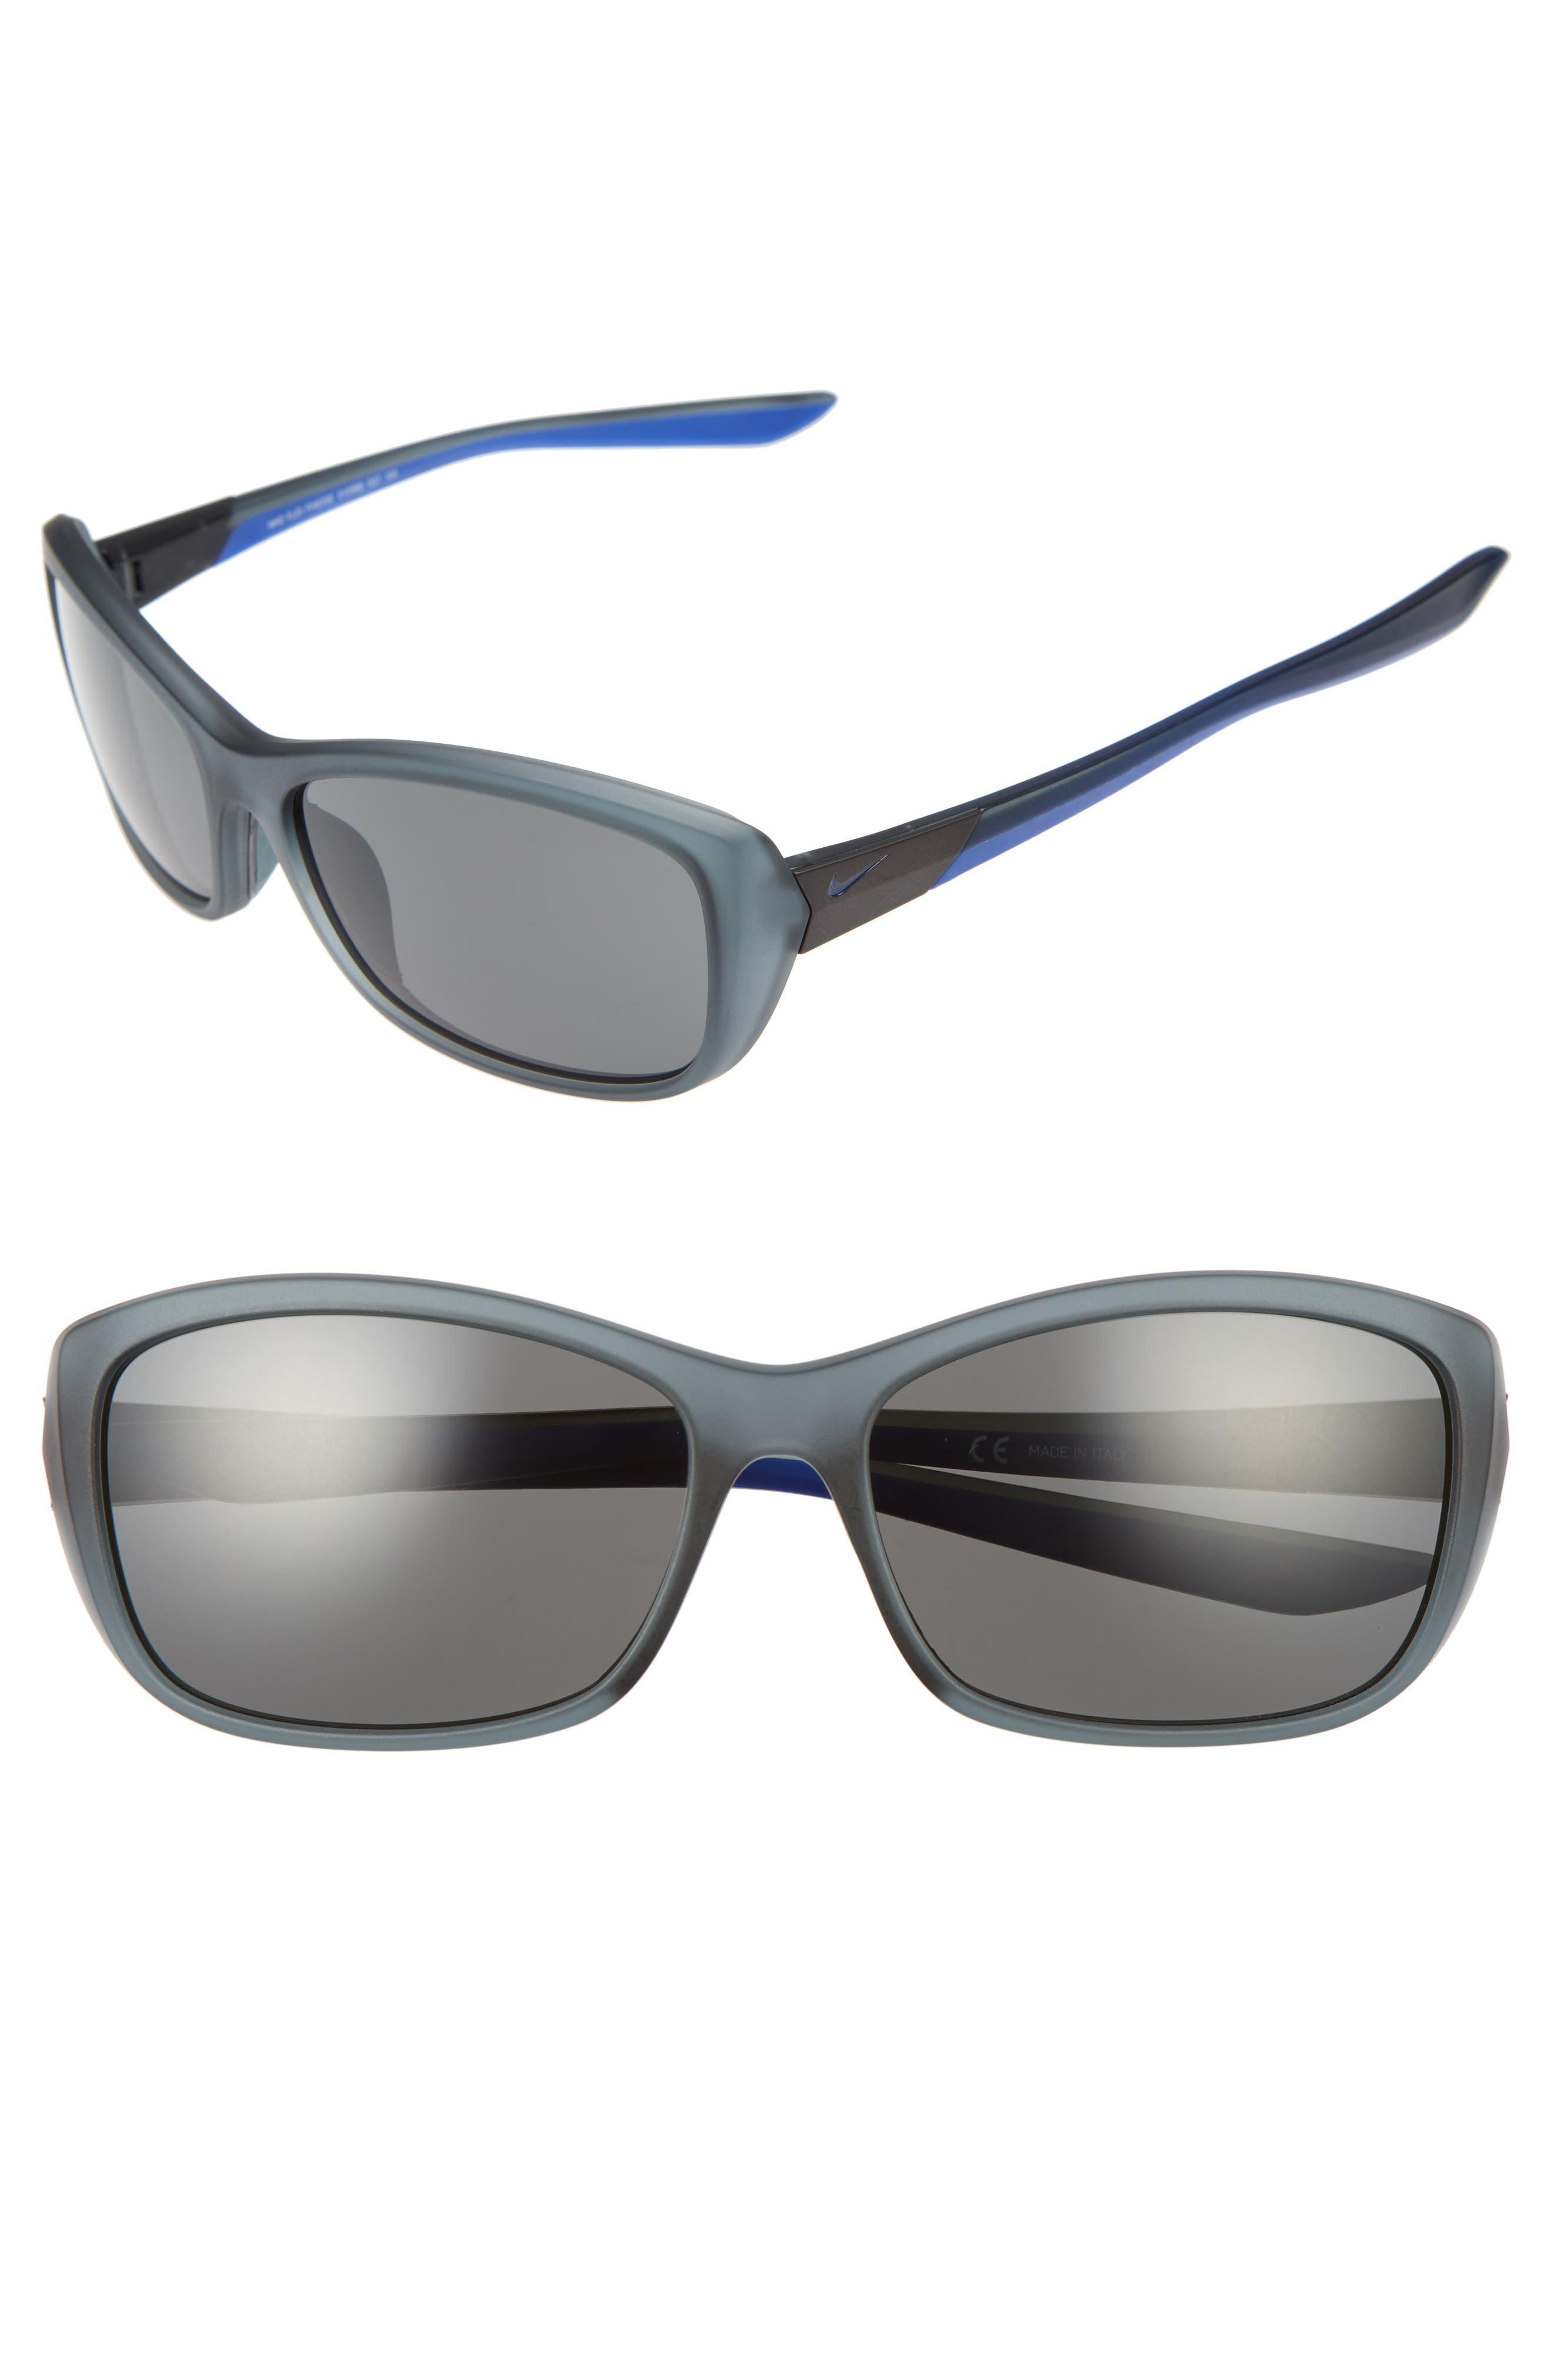 Nike Flex Finesse 5m Sunglasses -